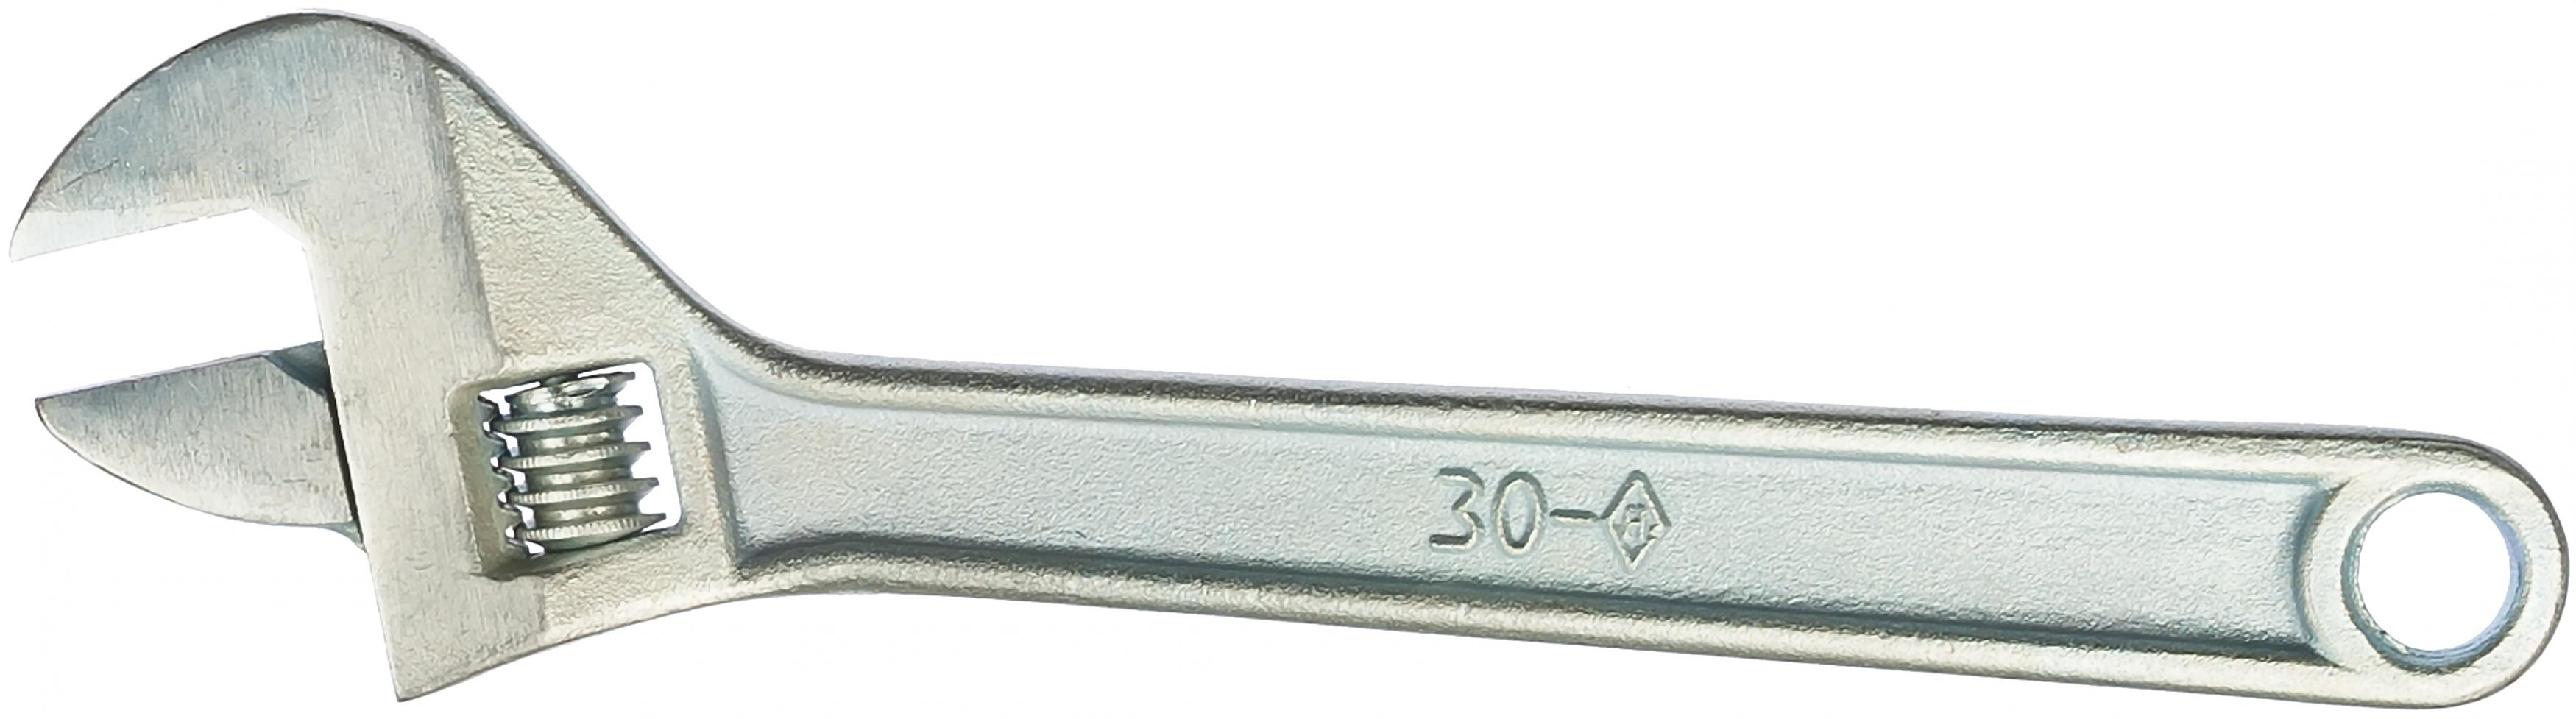 Ключ Nn МИ 15575 (0 - 30 мм) ключ разводной truper pet